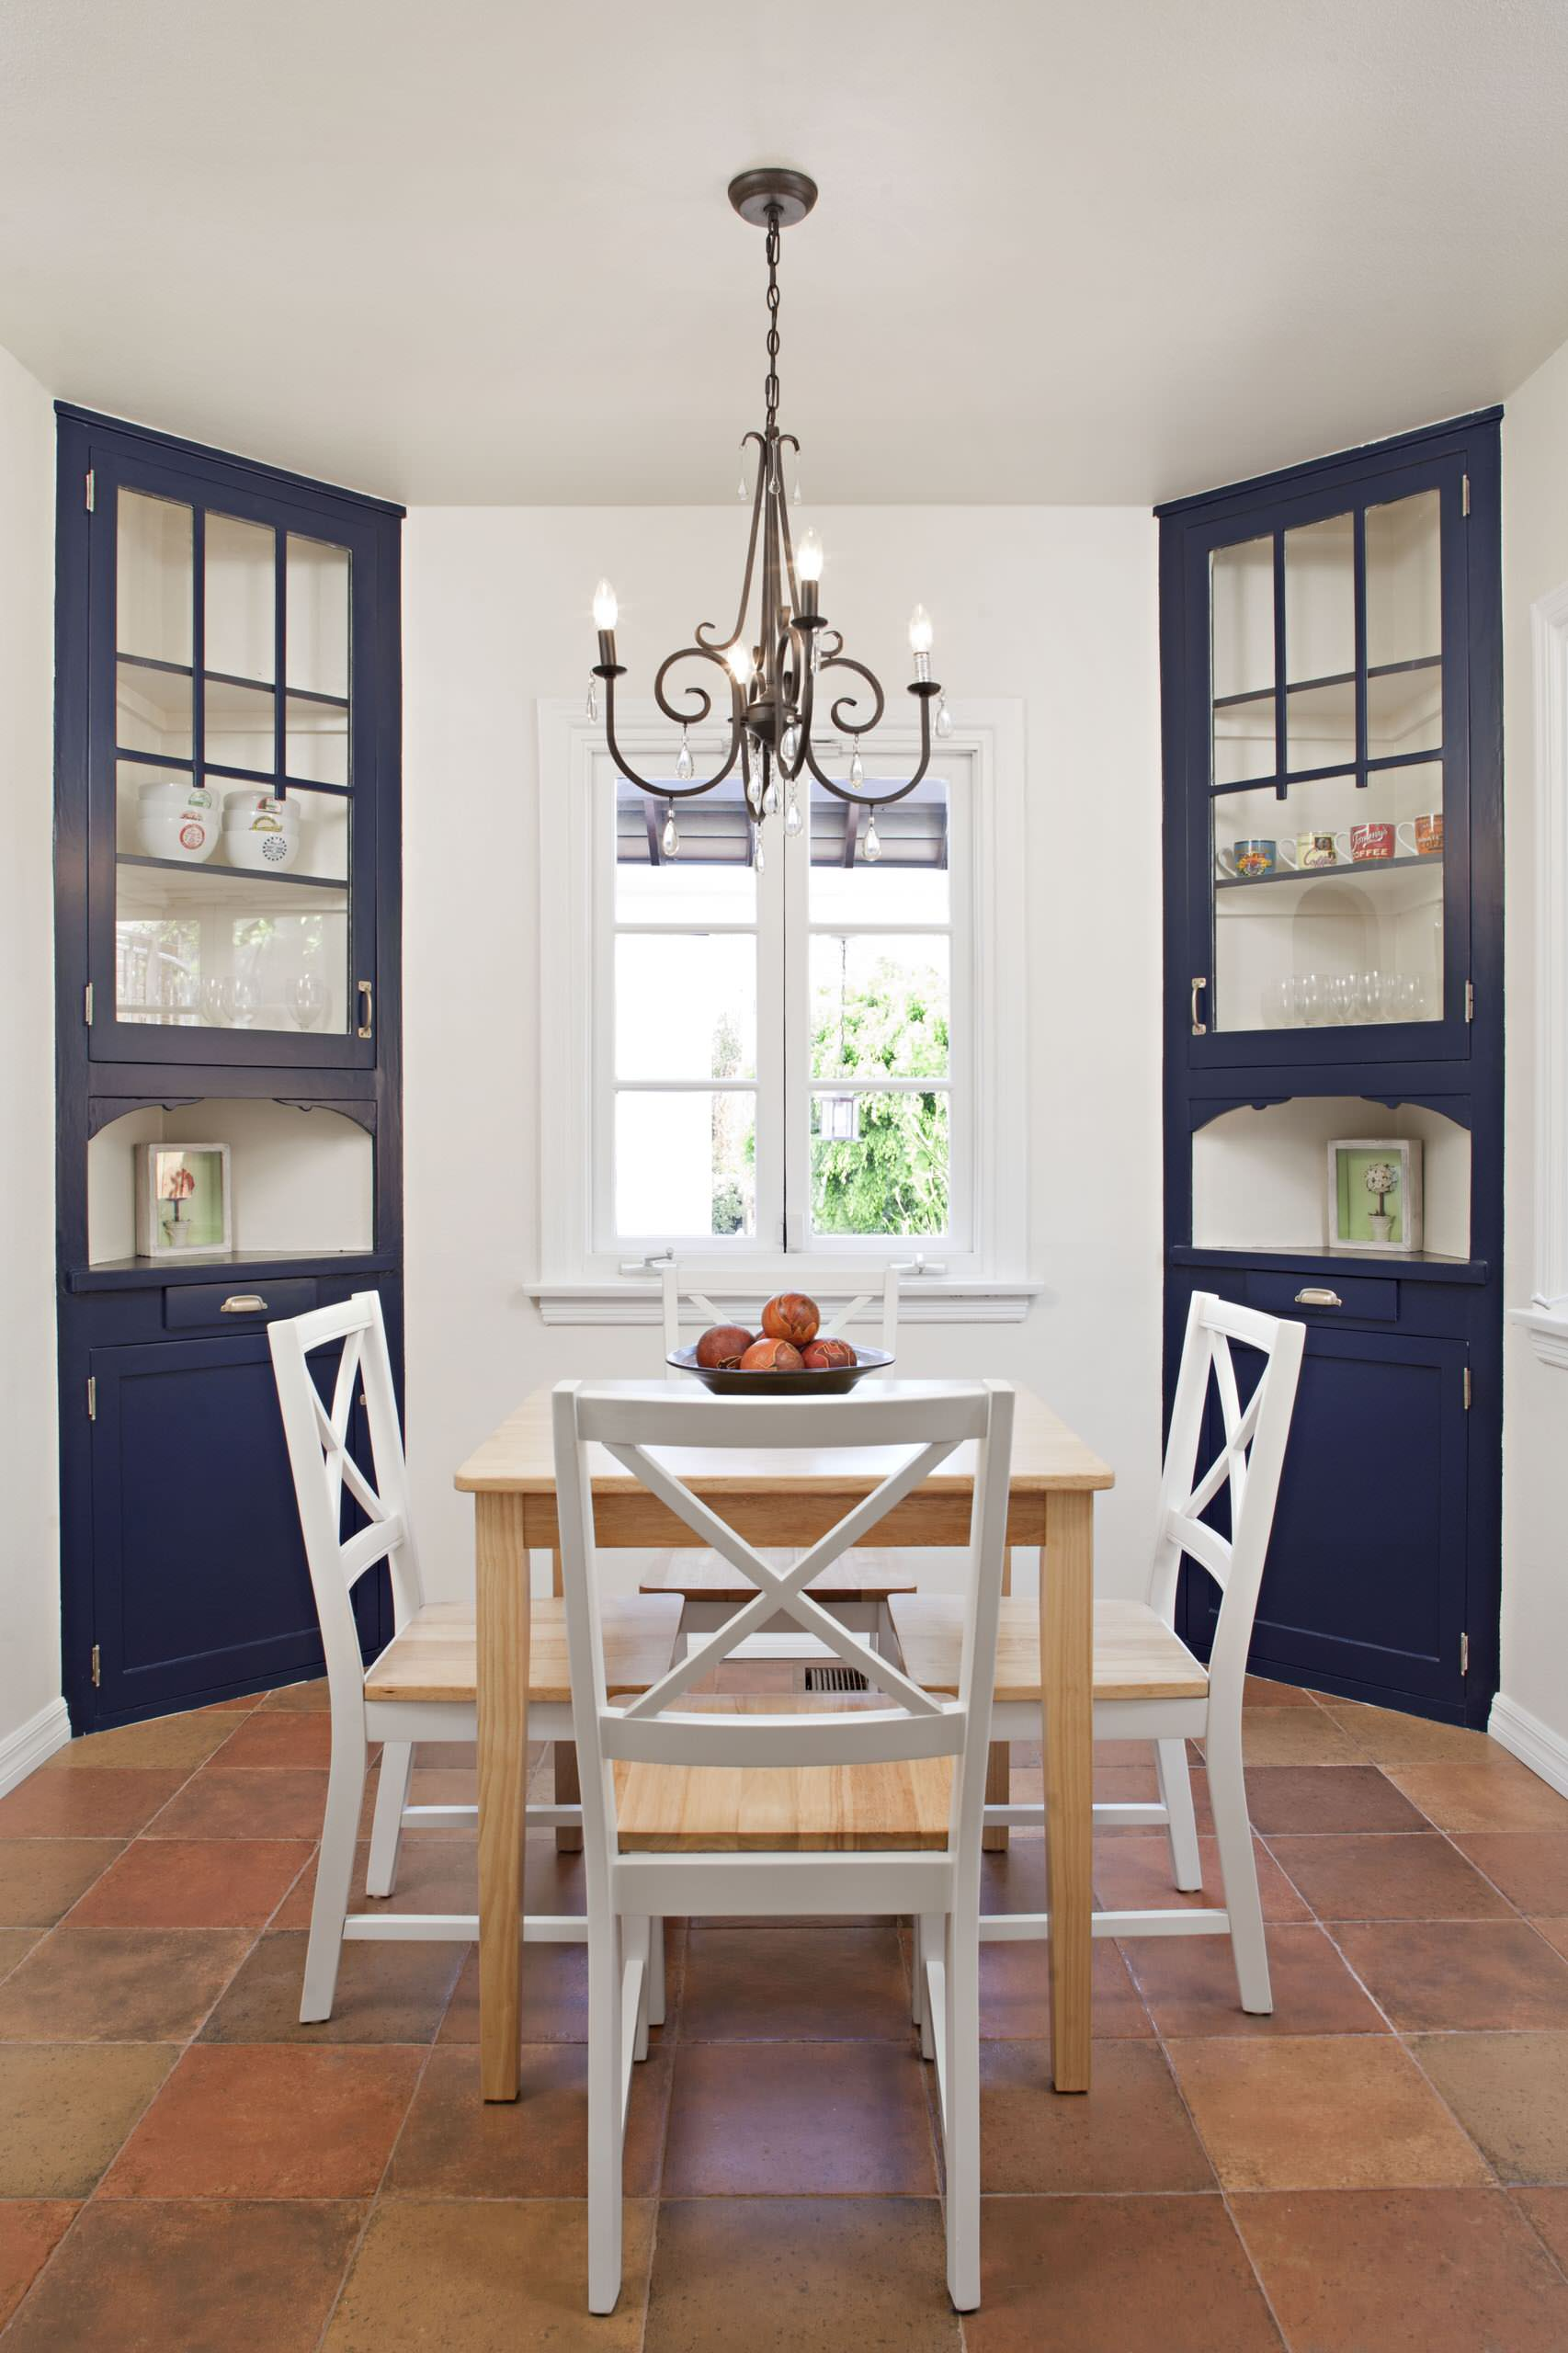 corner in the dining room in a beautiful performance photo 04 - Идеи и советы для вашего ремонта